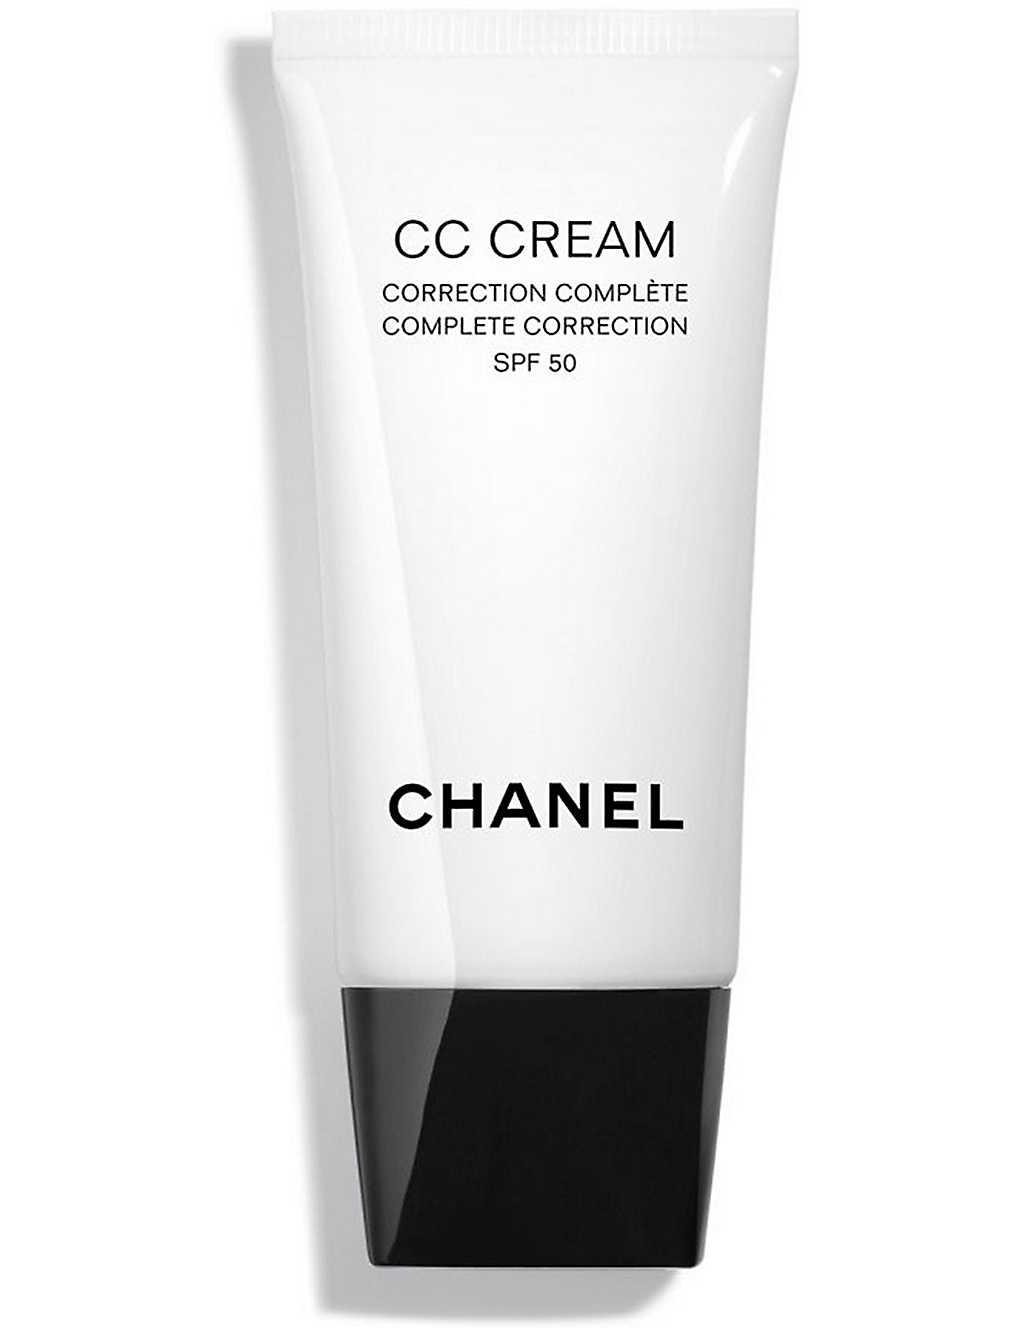 CC Cream Super Active Complete Correction SPF 50 30ml - BEIGE 70